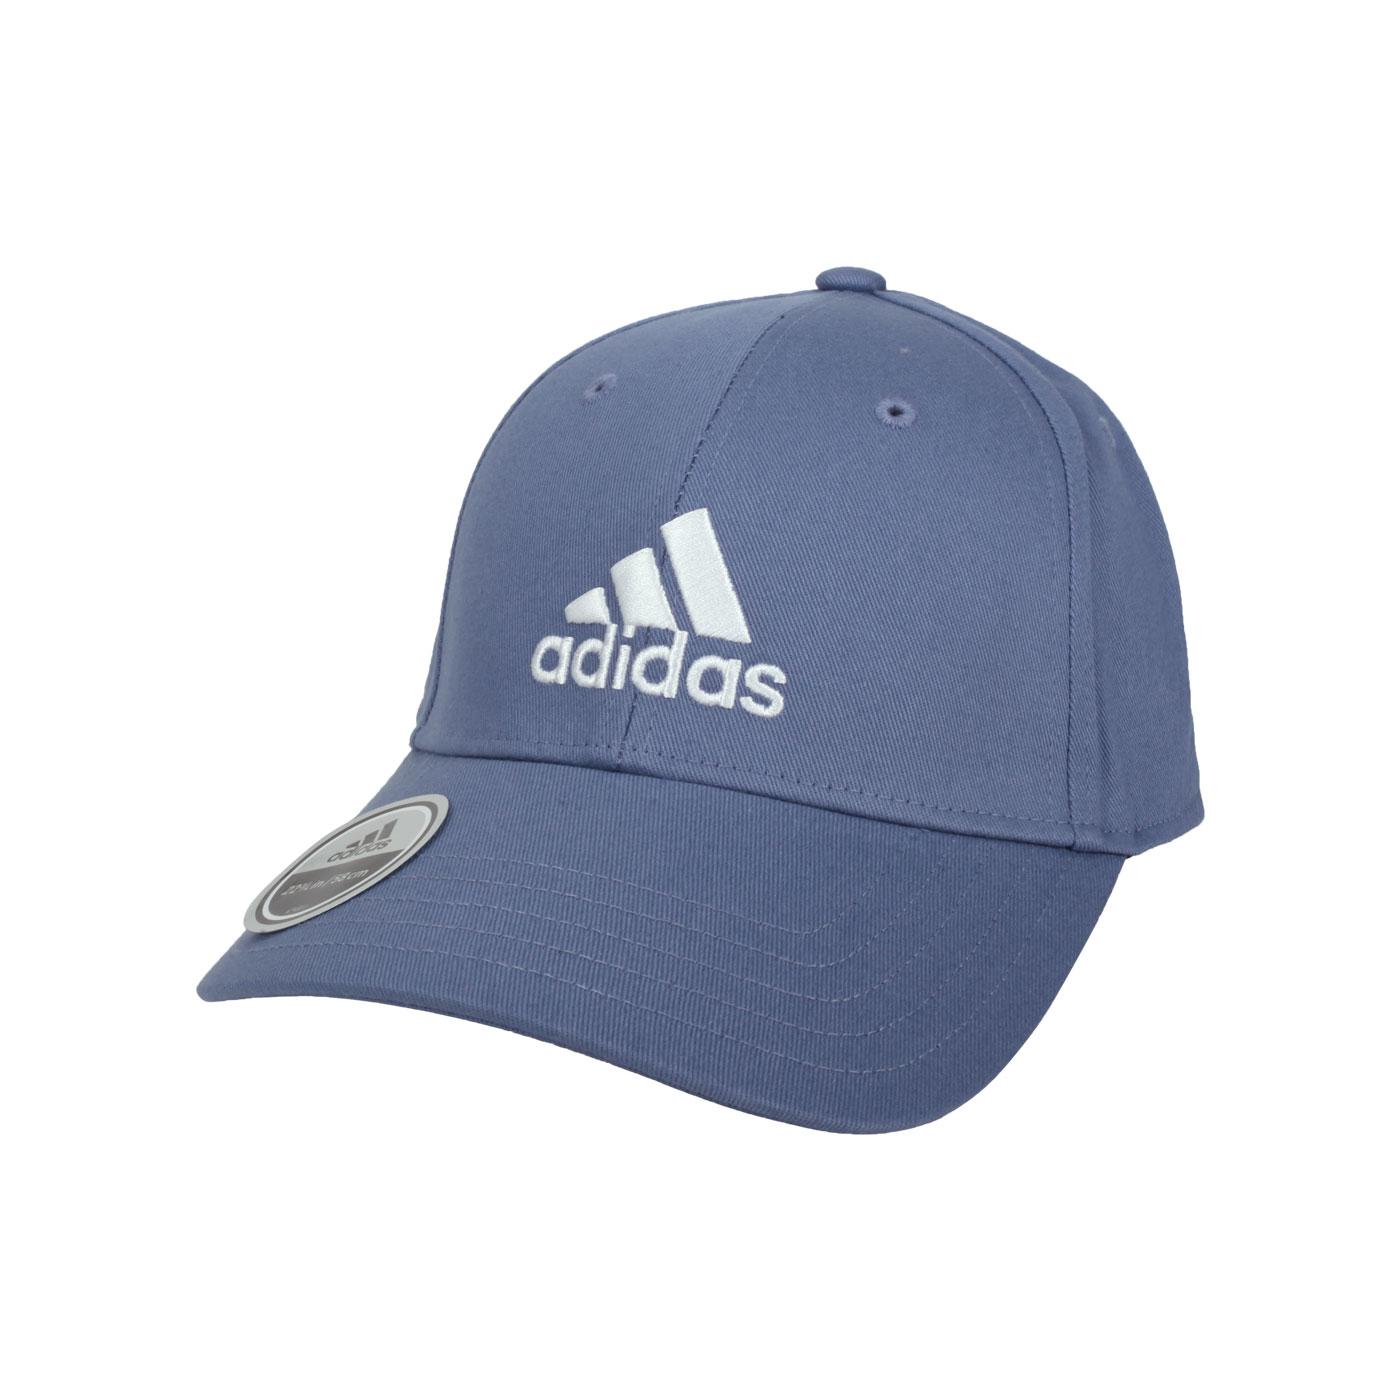 ADIDAS 棒球帽 H34474 - 粉紫白